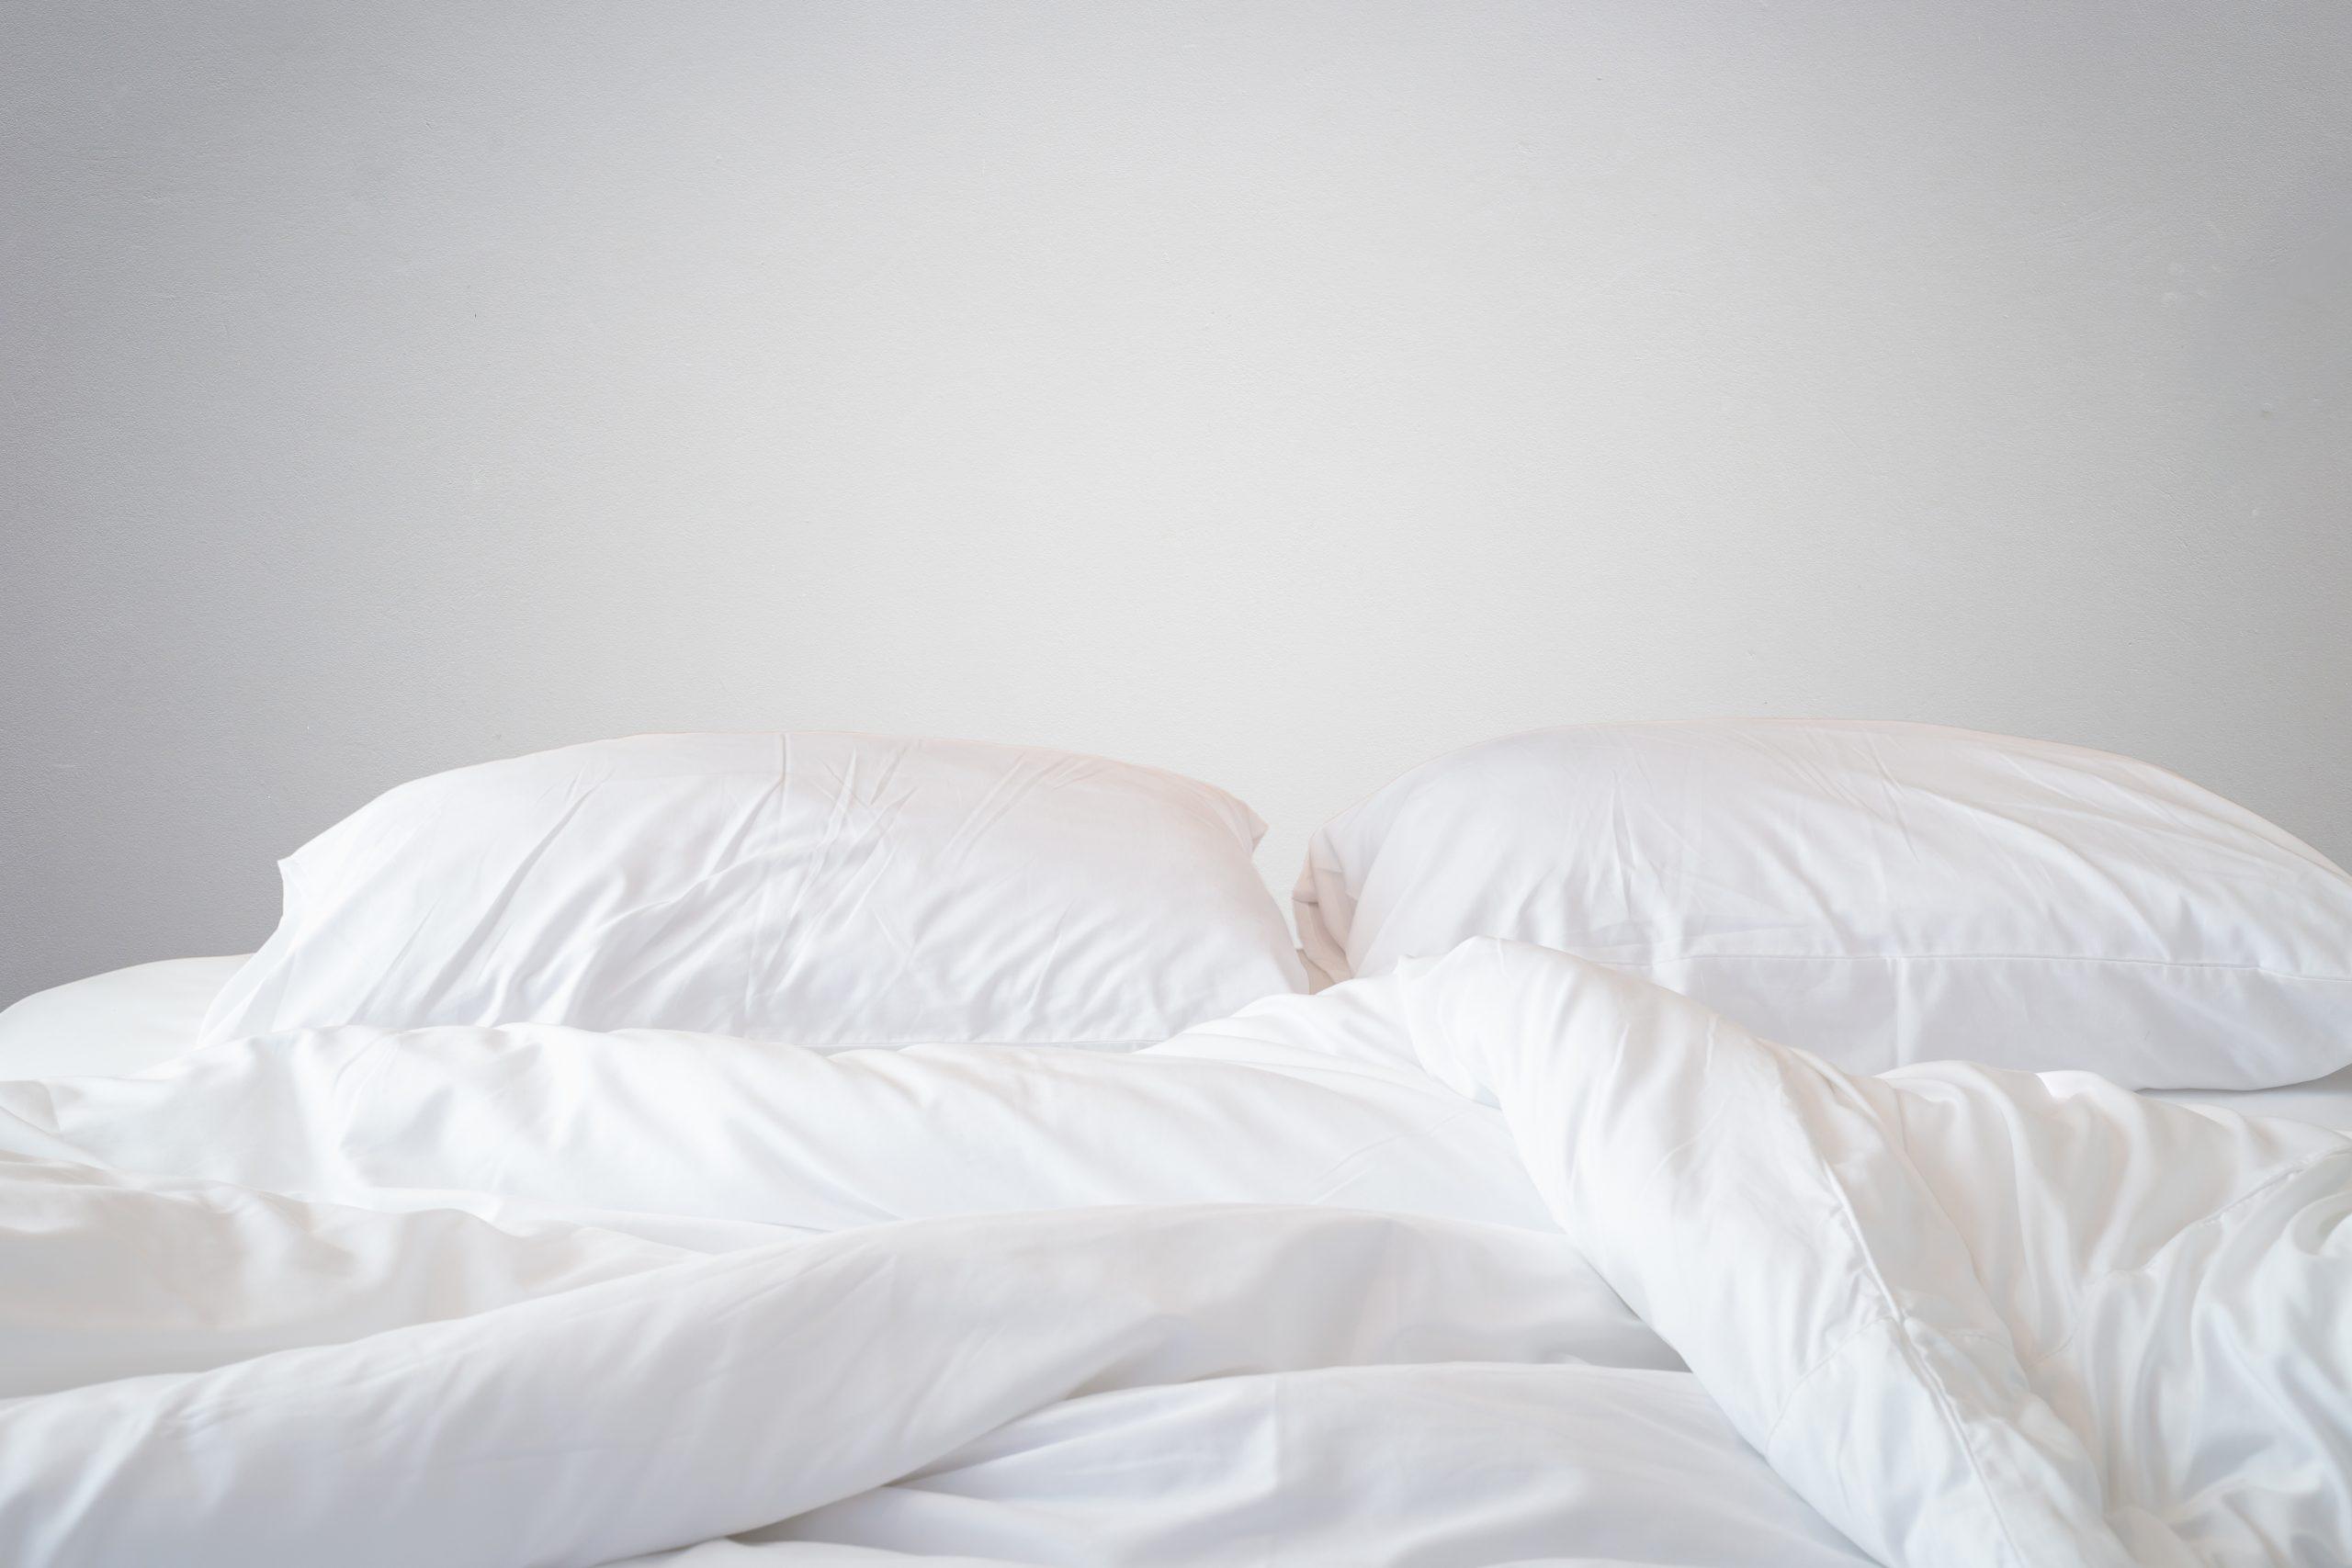 fresh clean white sheets